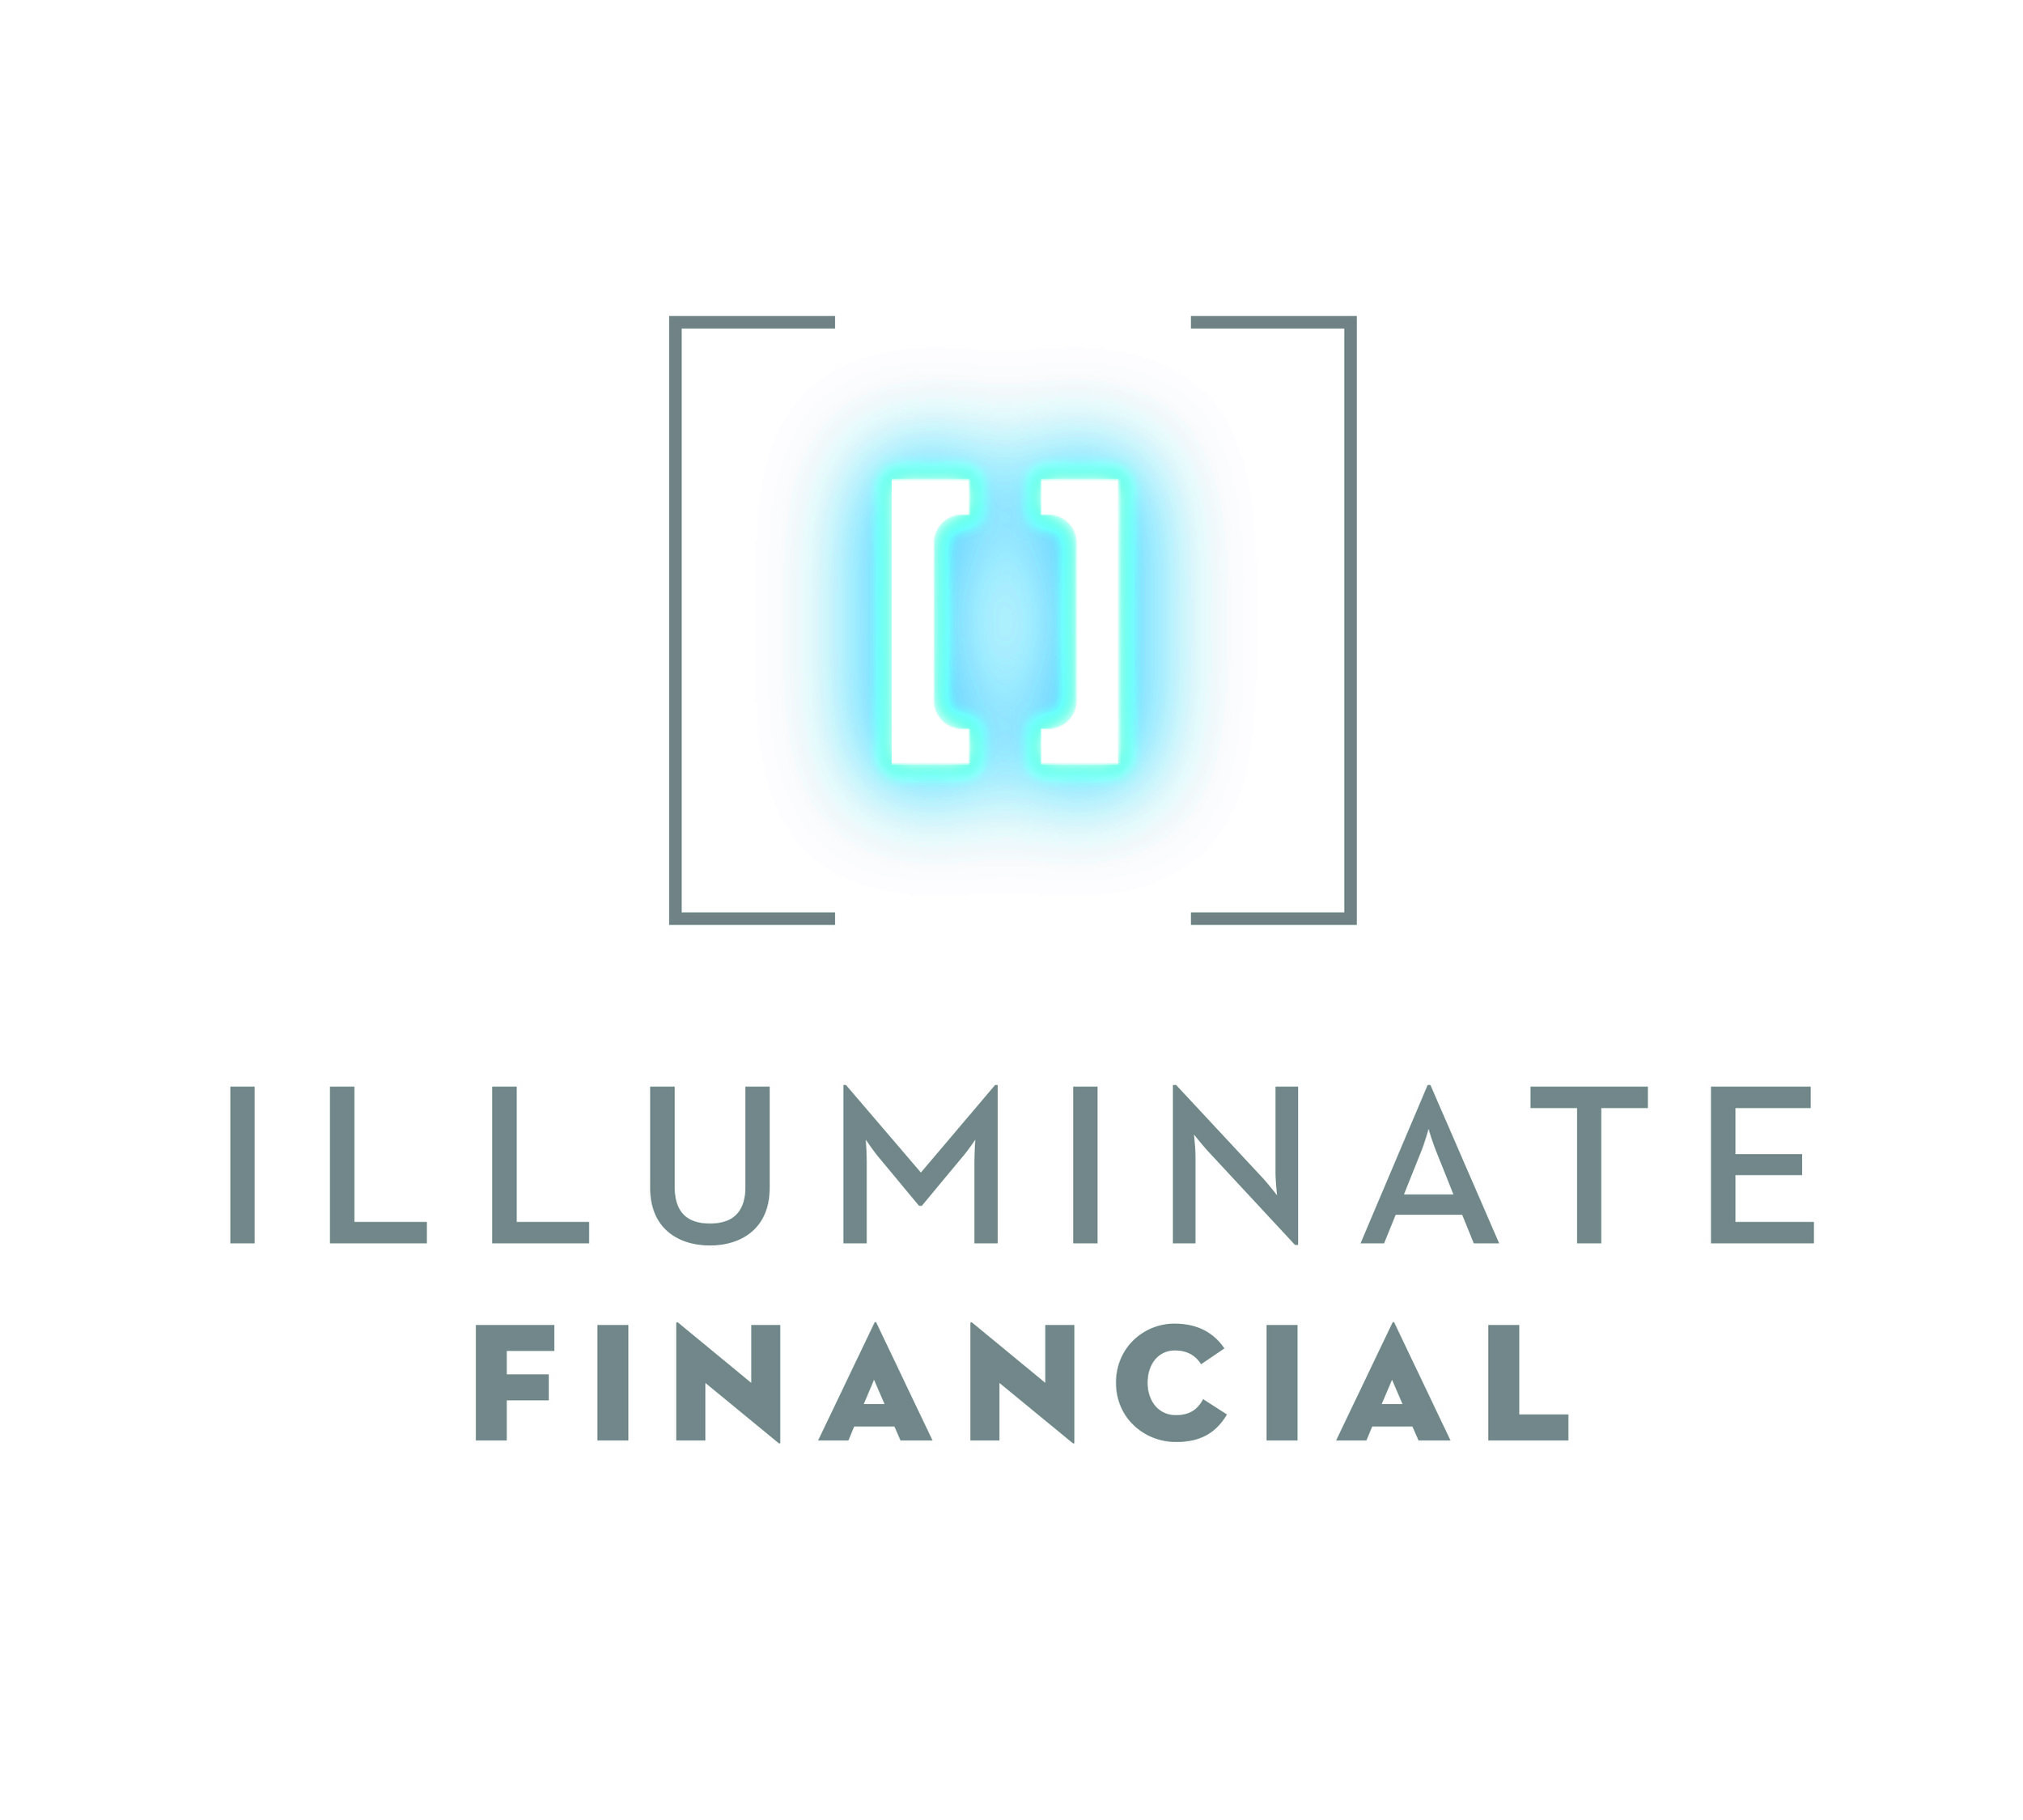 IFM_logo_lit_PT_flat.jpg